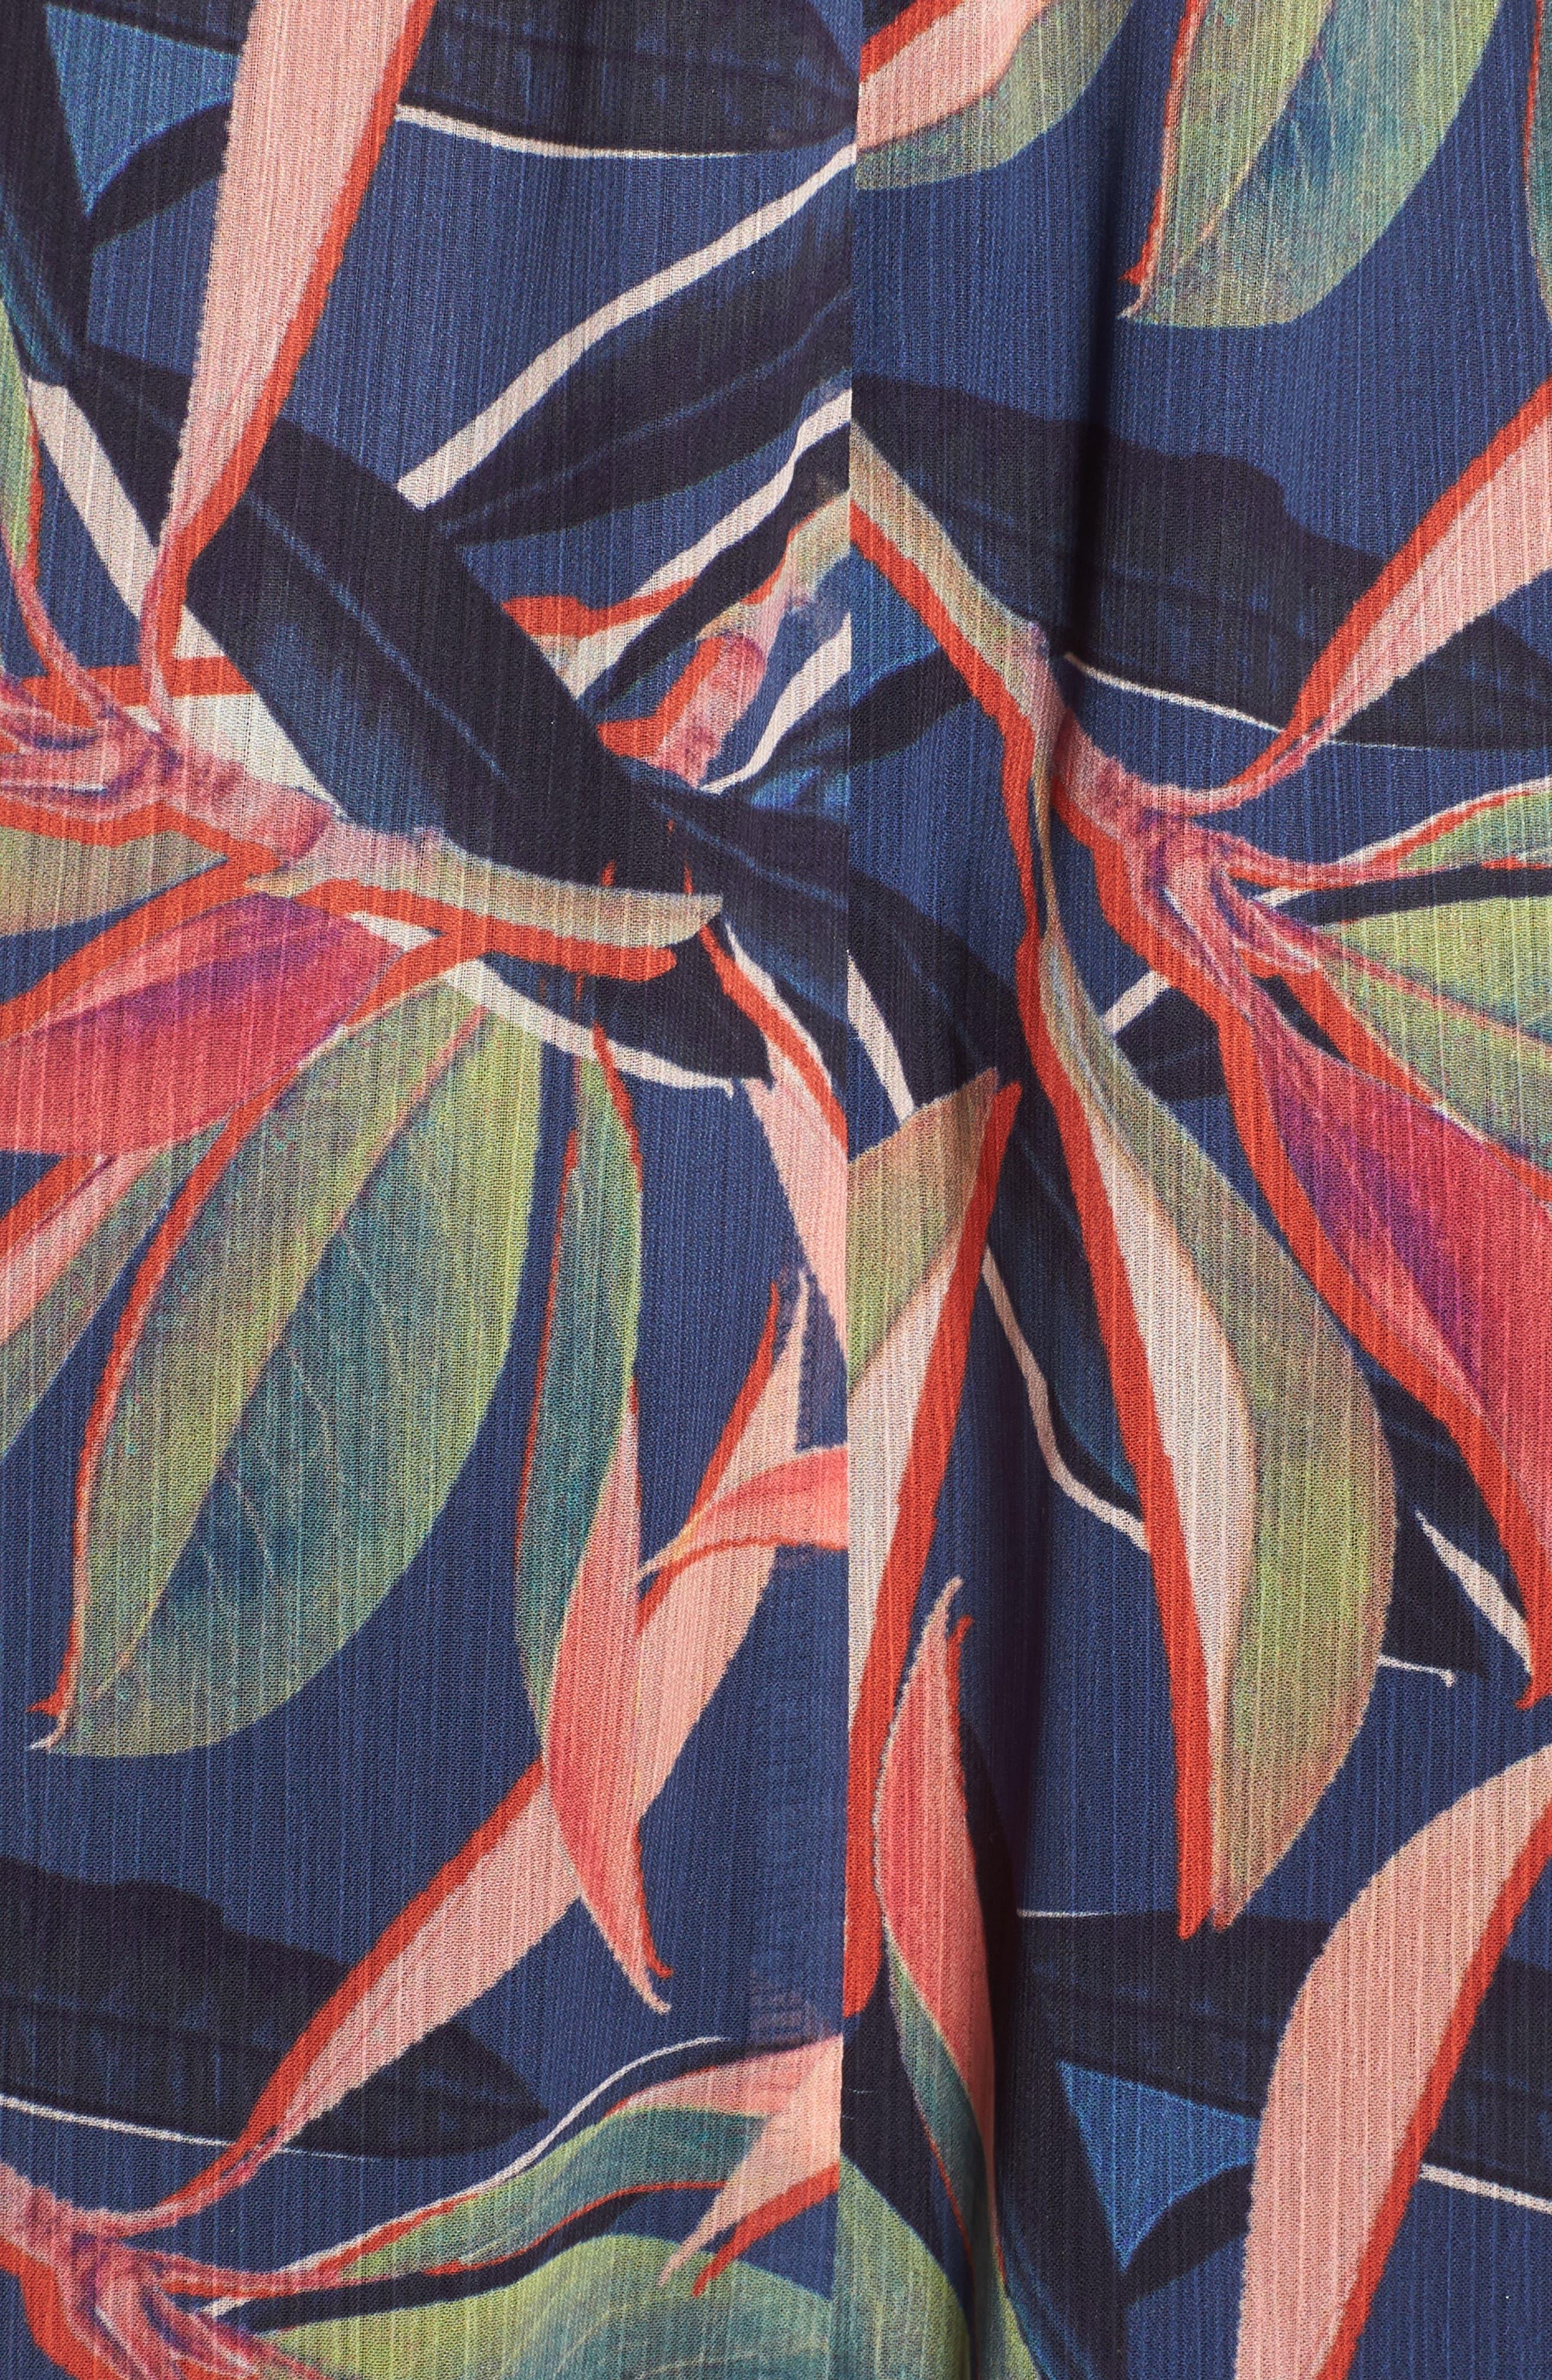 Ruffle Maxi Dress,                             Alternate thumbnail 7, color,                             Multi